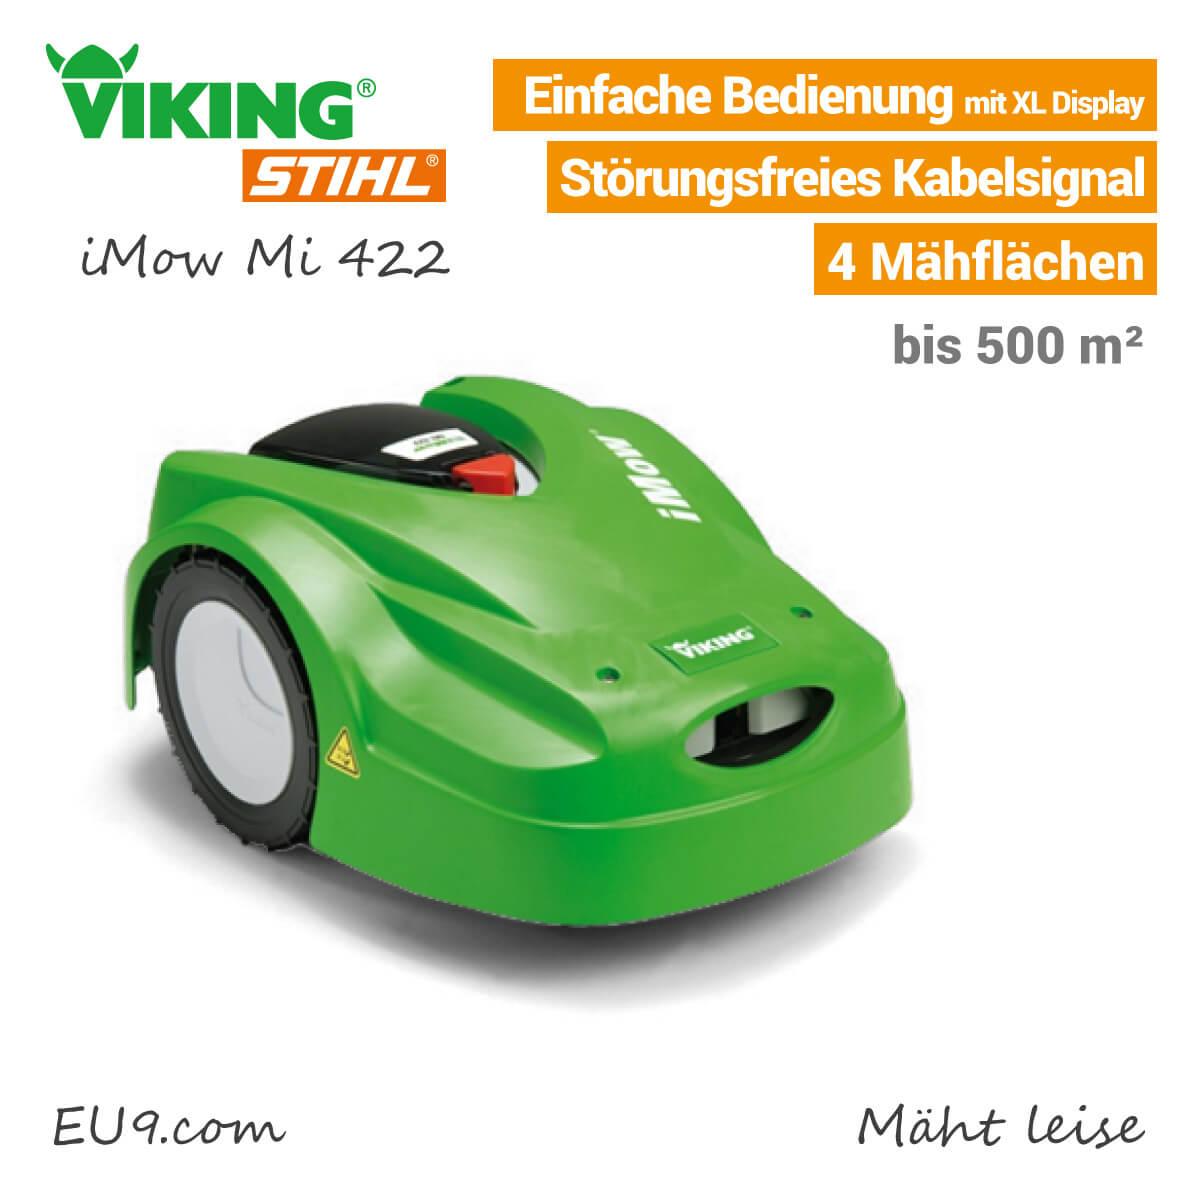 viking mi 422 imow rasenroboter bei eu9 robotics kaufen. Black Bedroom Furniture Sets. Home Design Ideas